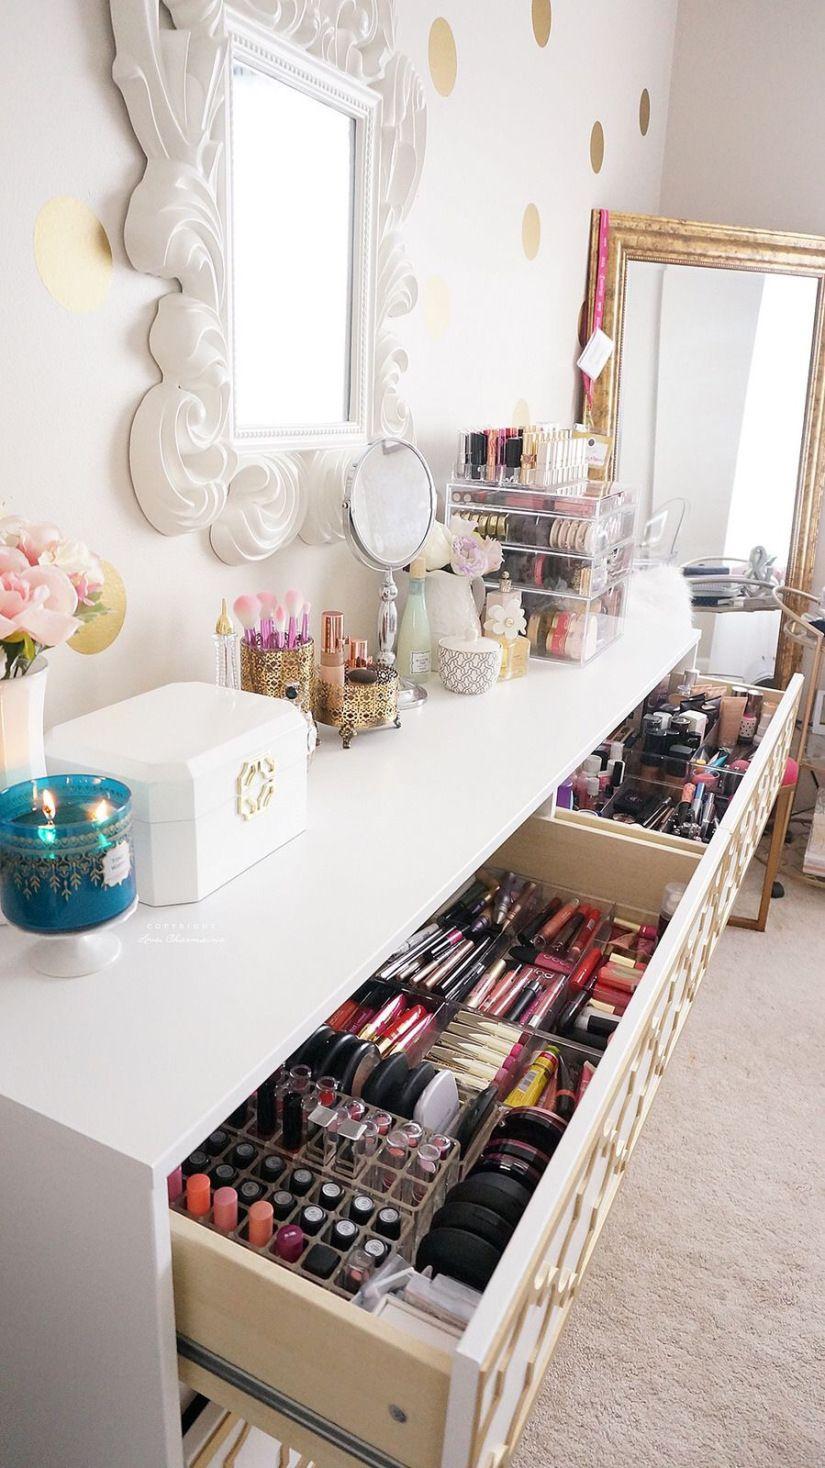 Verbazingwekkend iDream of Beauty Must-Haves - Kaptafels, Make up tafels en AV-43